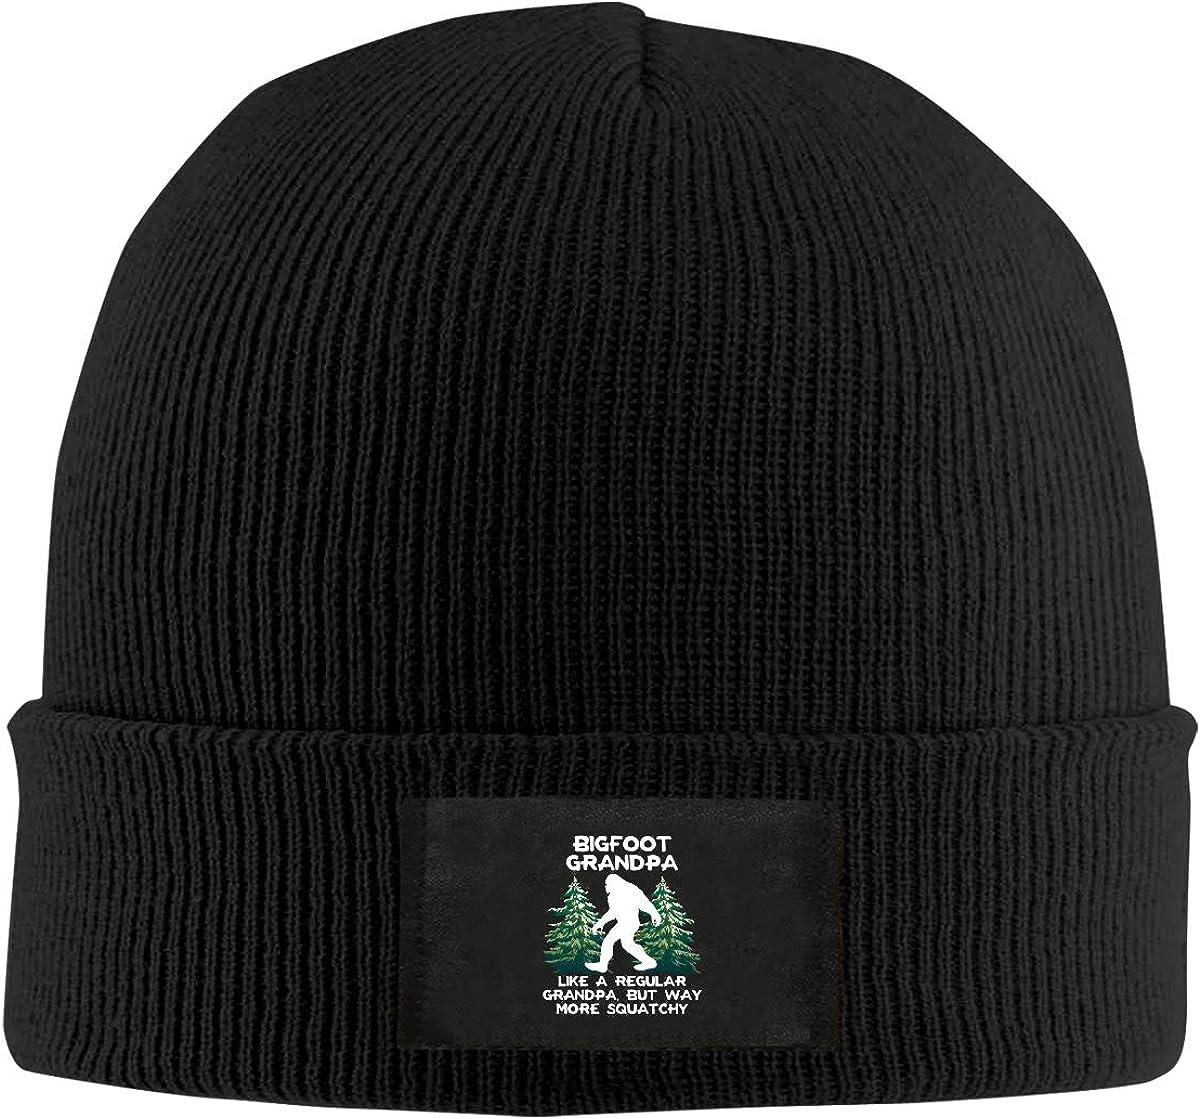 LRHUI Bigfoot Winter Knitted Hat Warm Wool Skull Beanie Cap